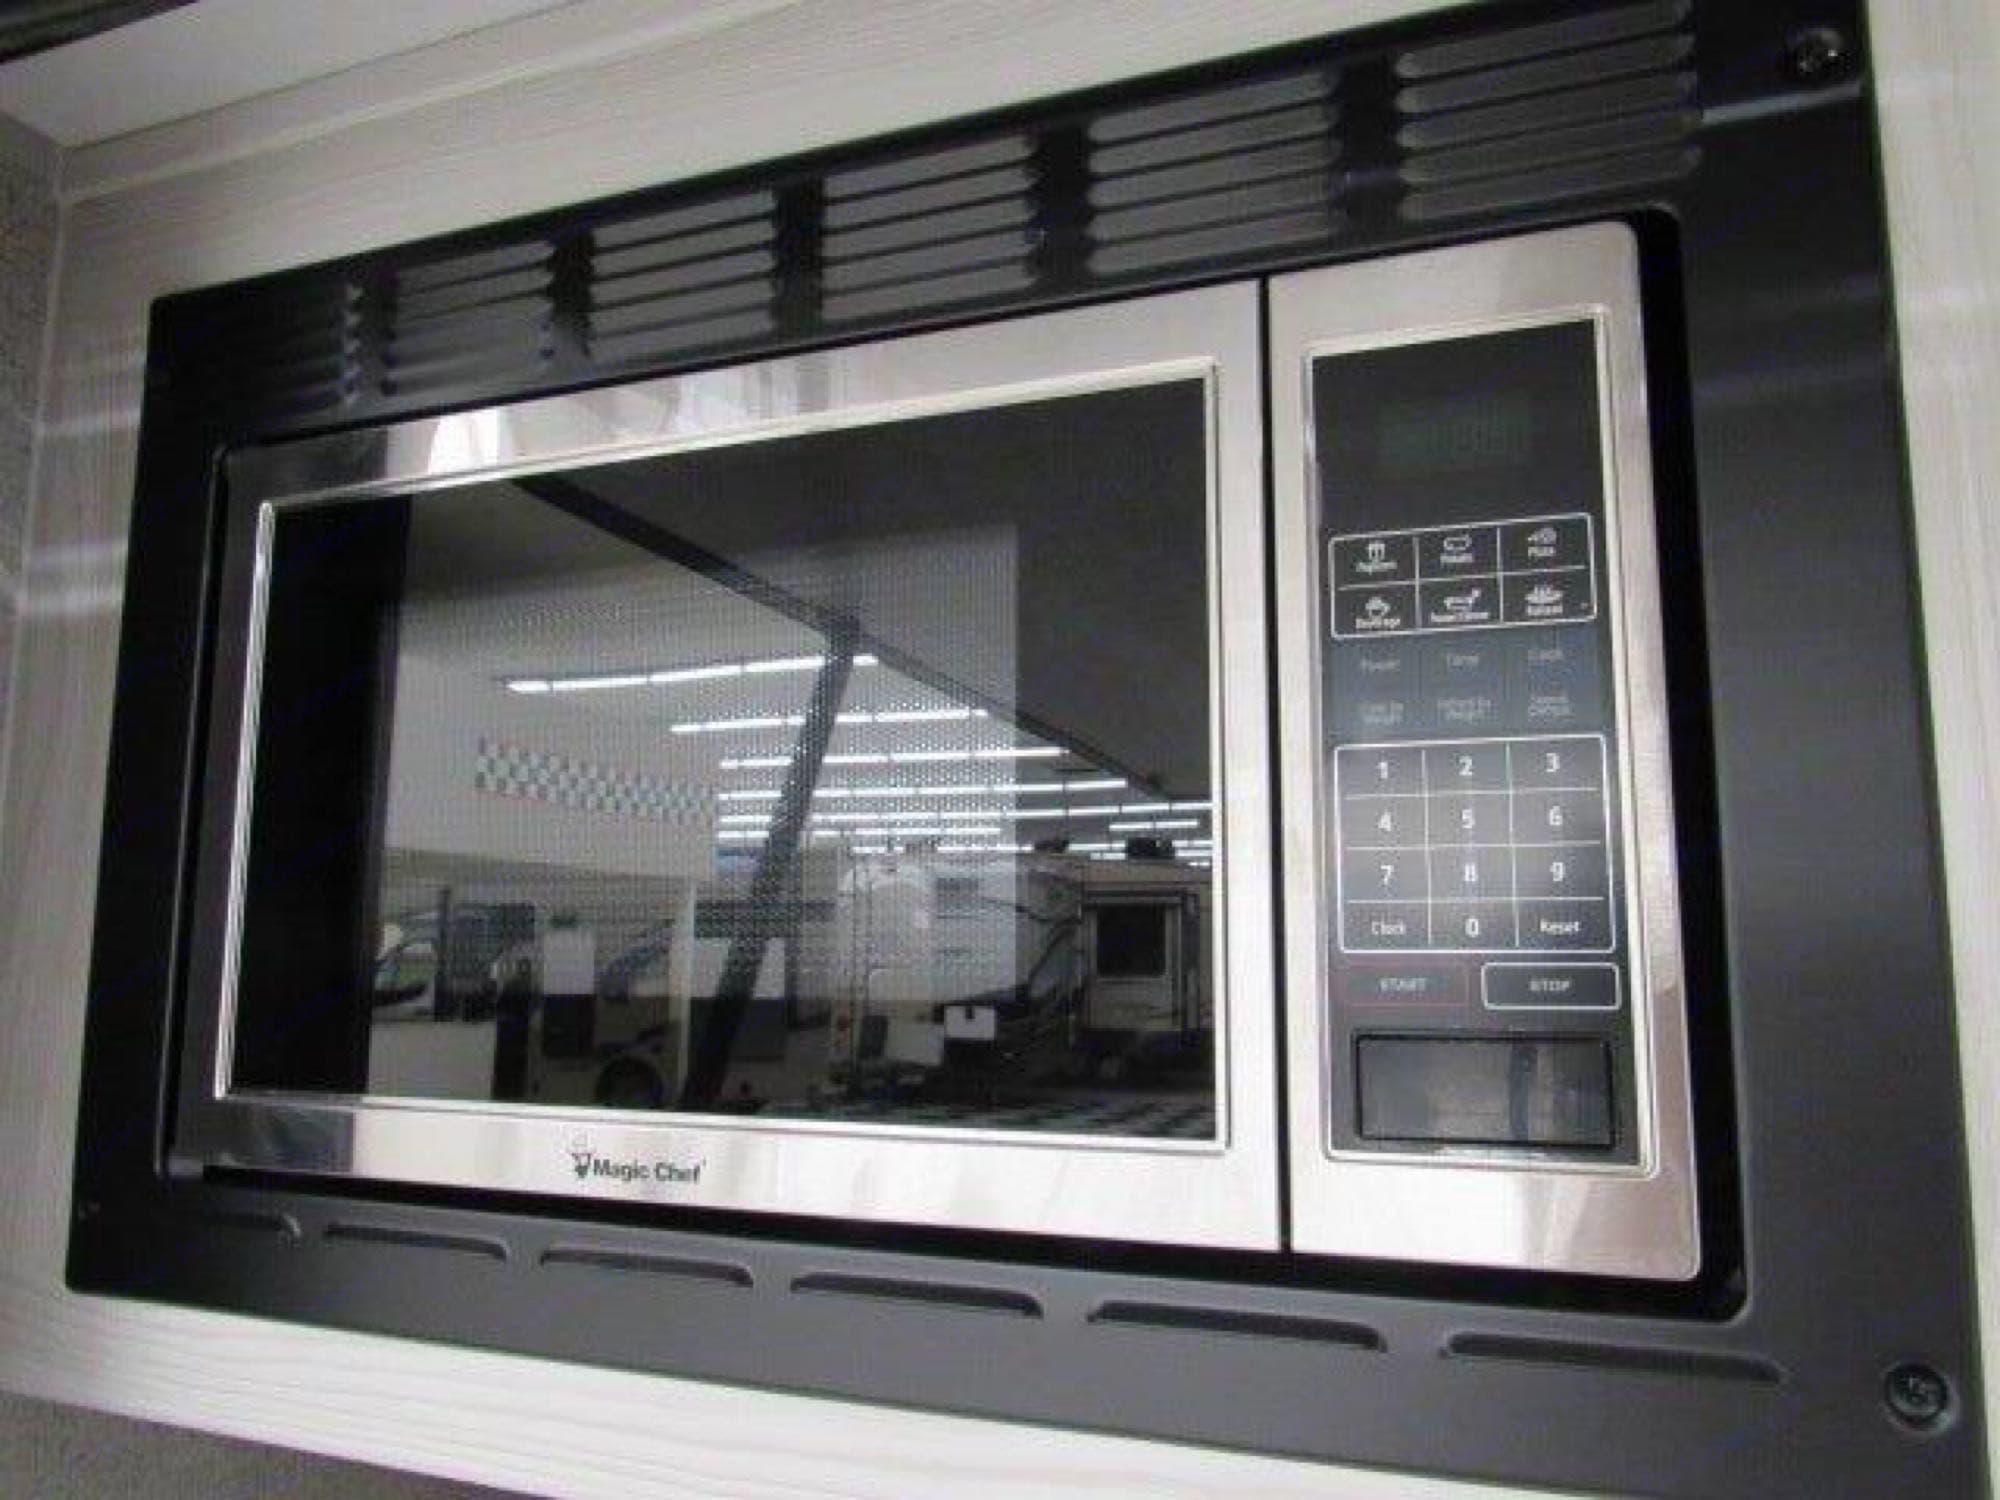 Microwave110AC. ForestRiver RockwoodGeoPro12RK 2020